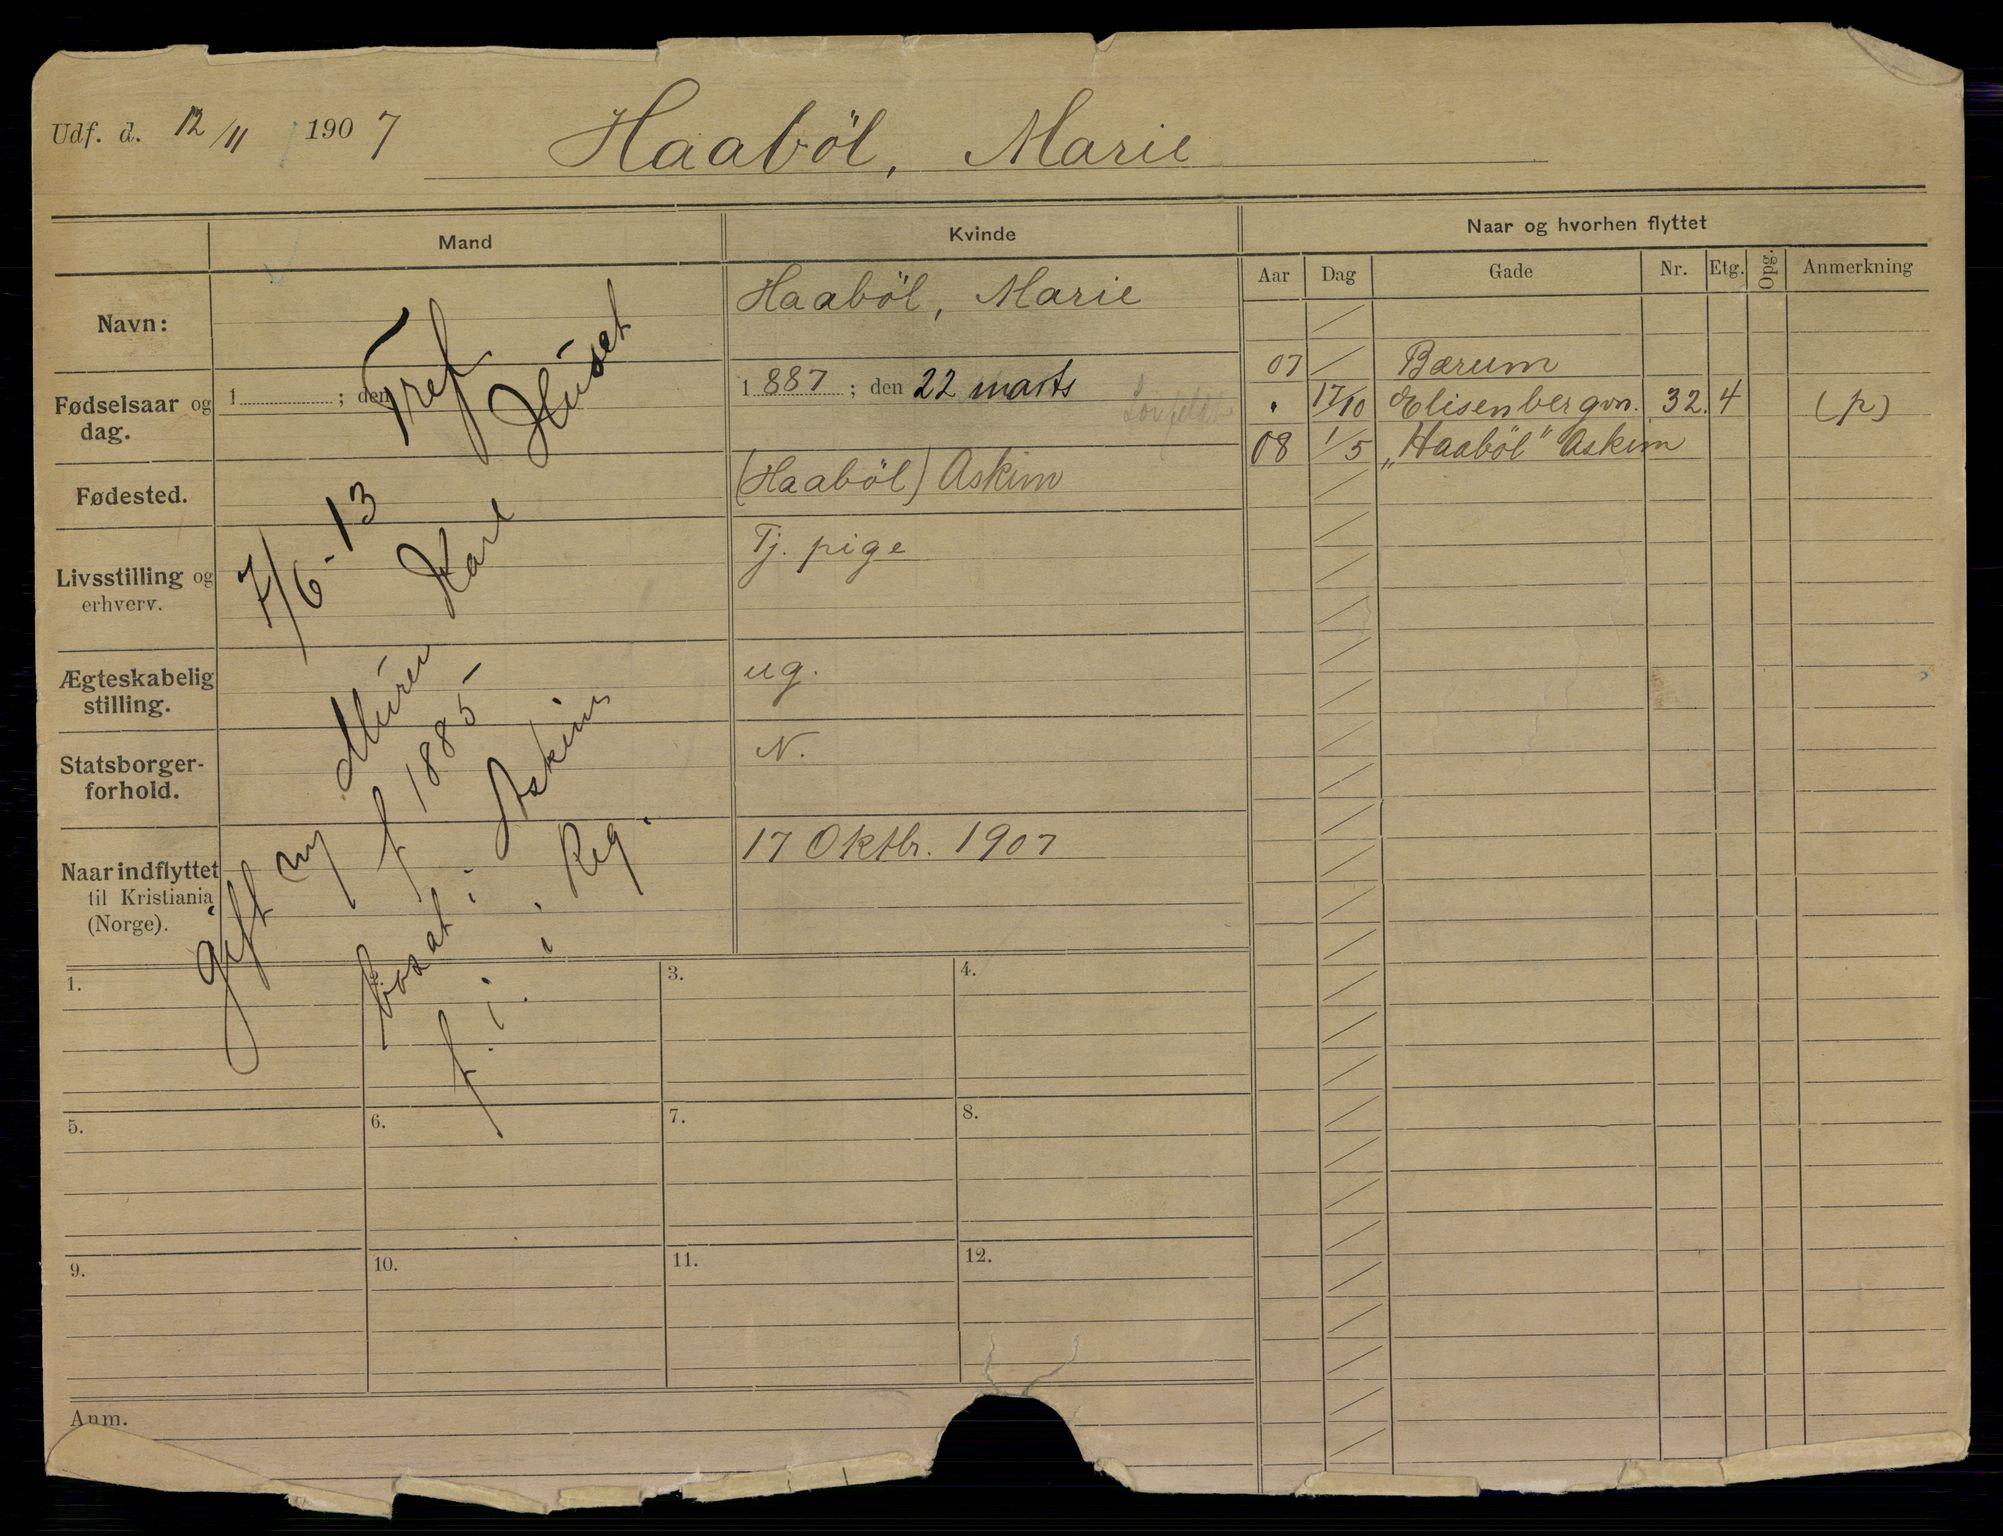 SAO, Oslo folkeregister, Registerkort, K/Kb/L0017: H - L, 1913